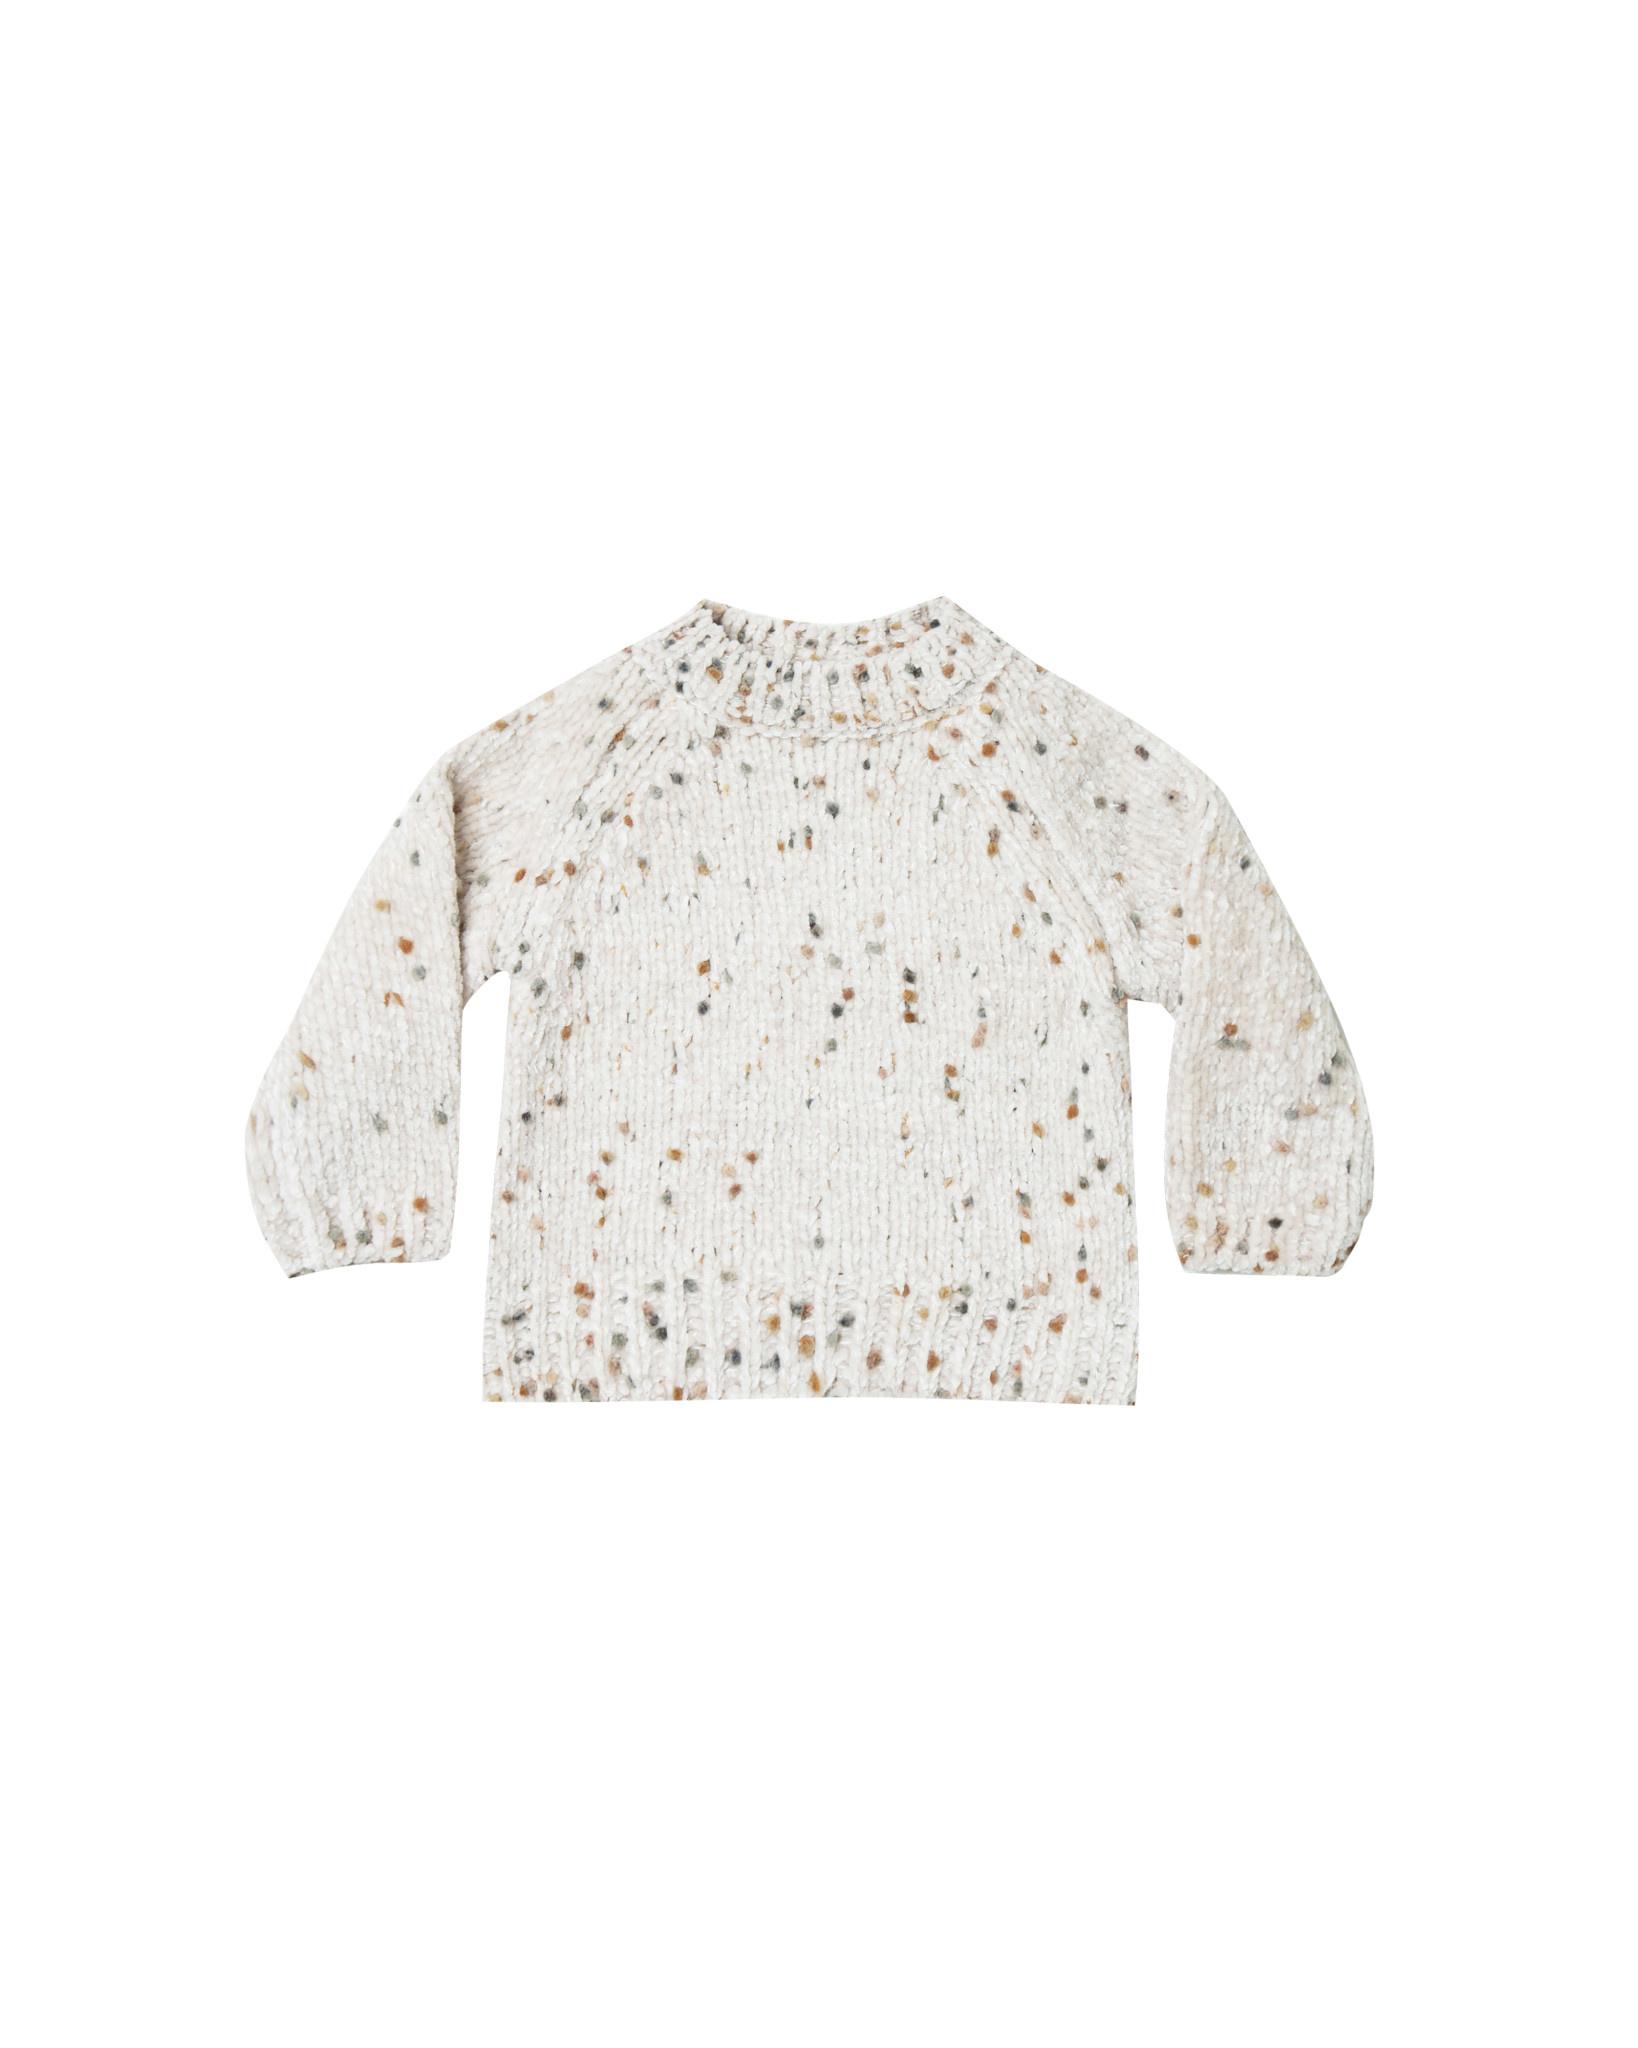 Rylee & Cru Pom Chenille Sweater